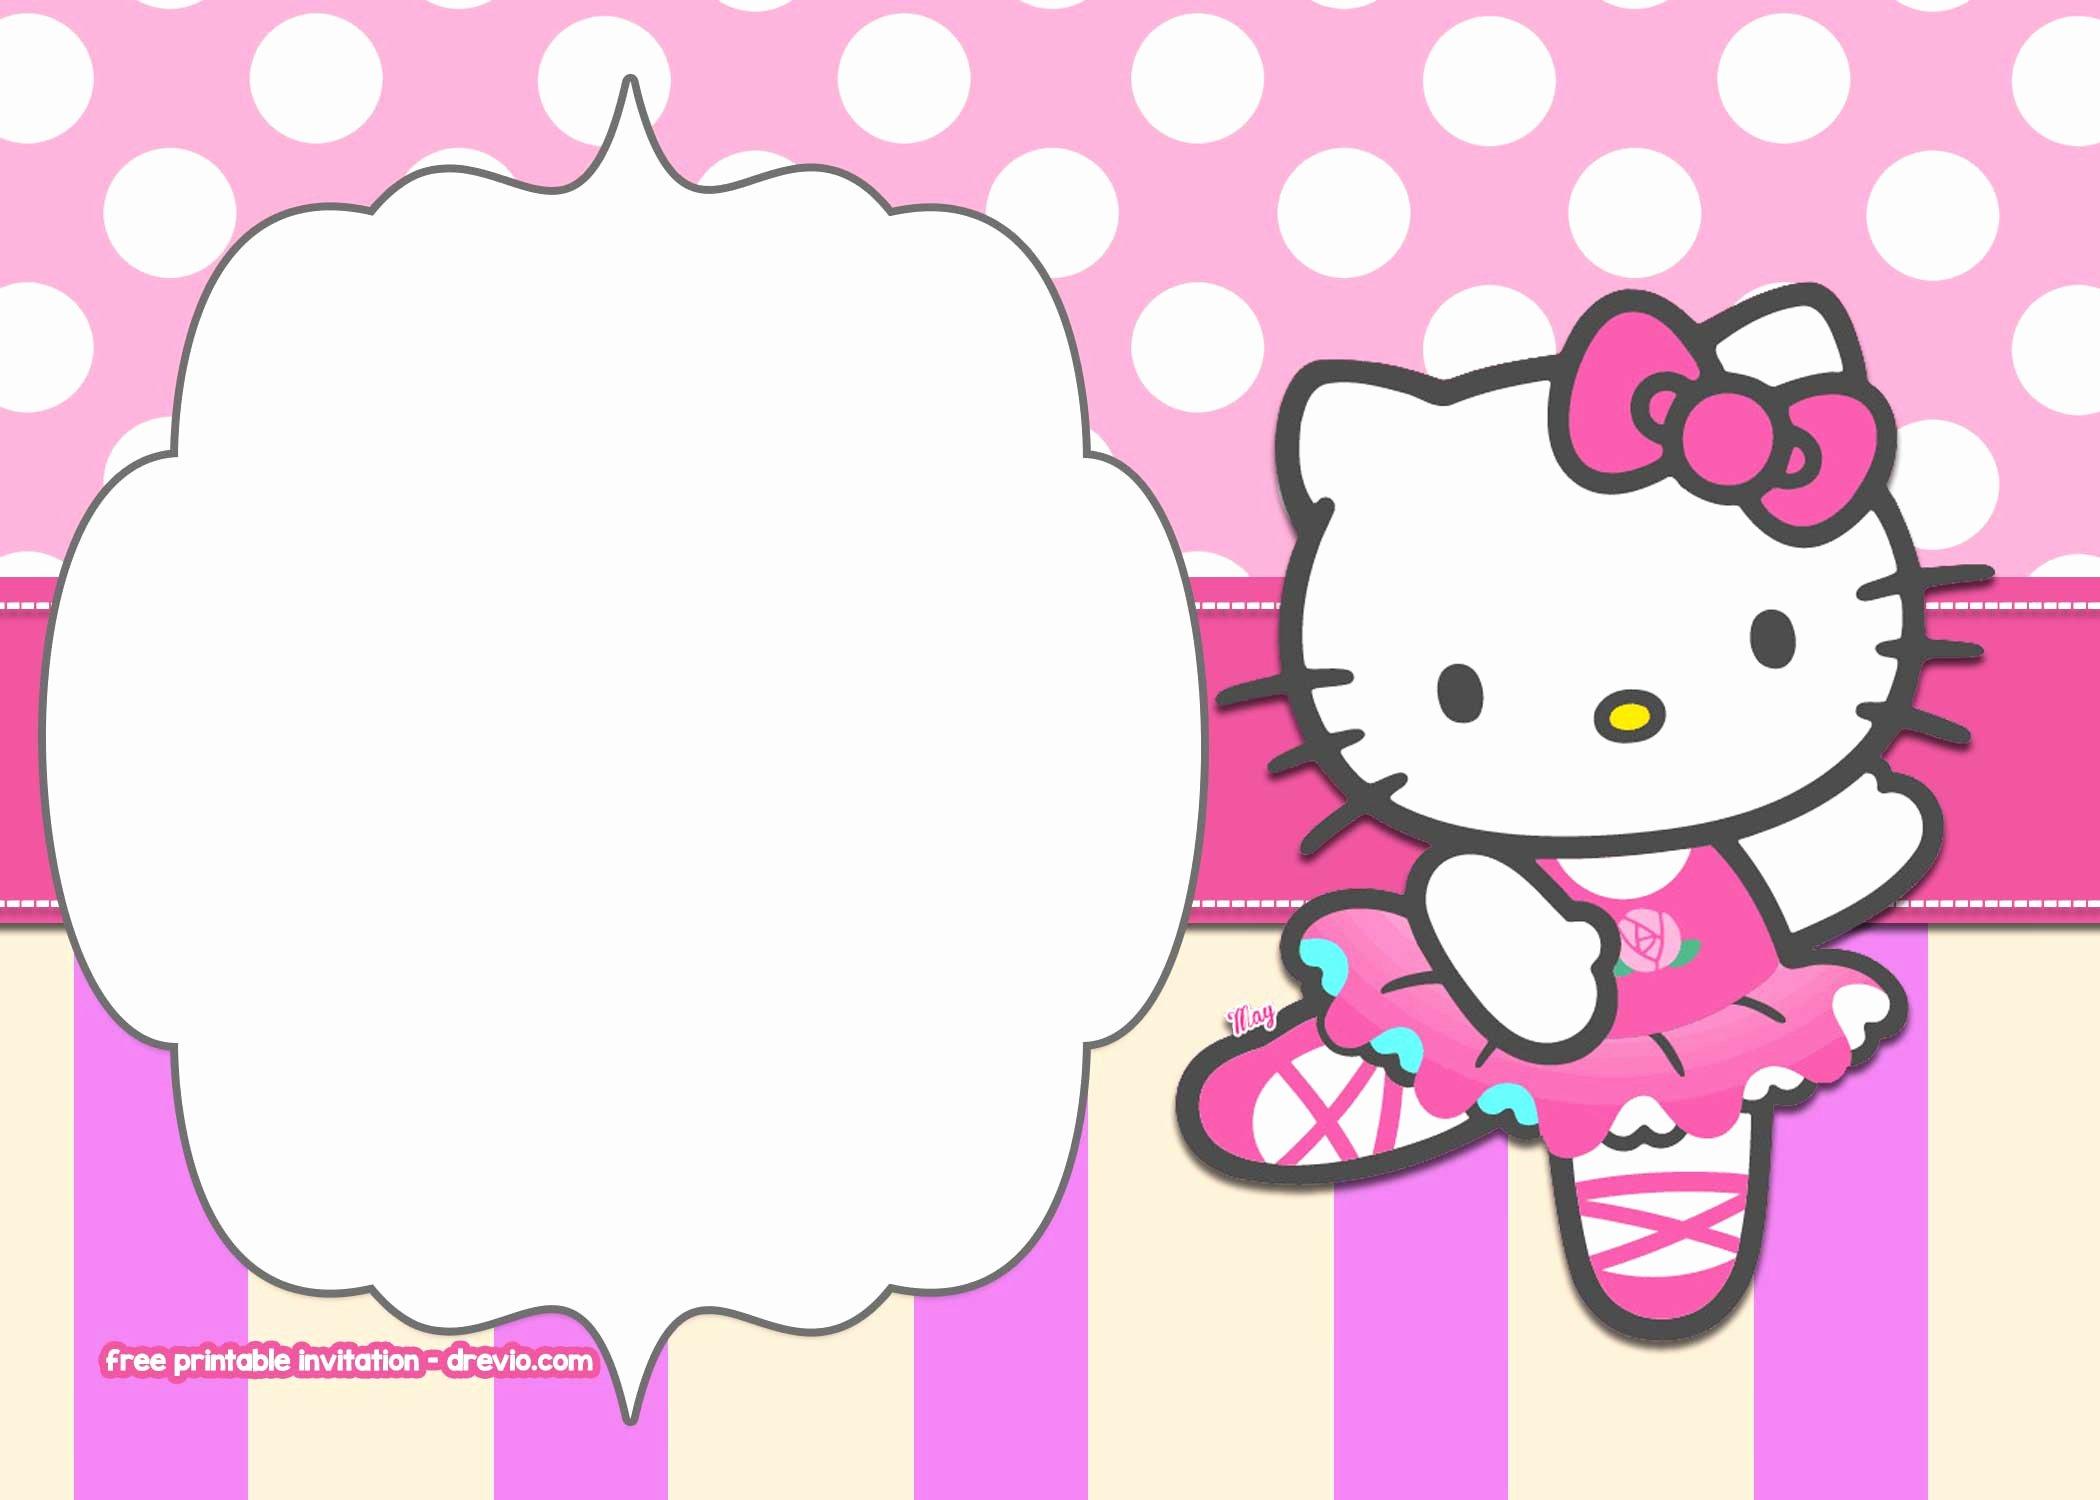 Hello Kitty Invitation Template Inspirational Free Printable Hello Kitty Pink Polka Dot Invitation